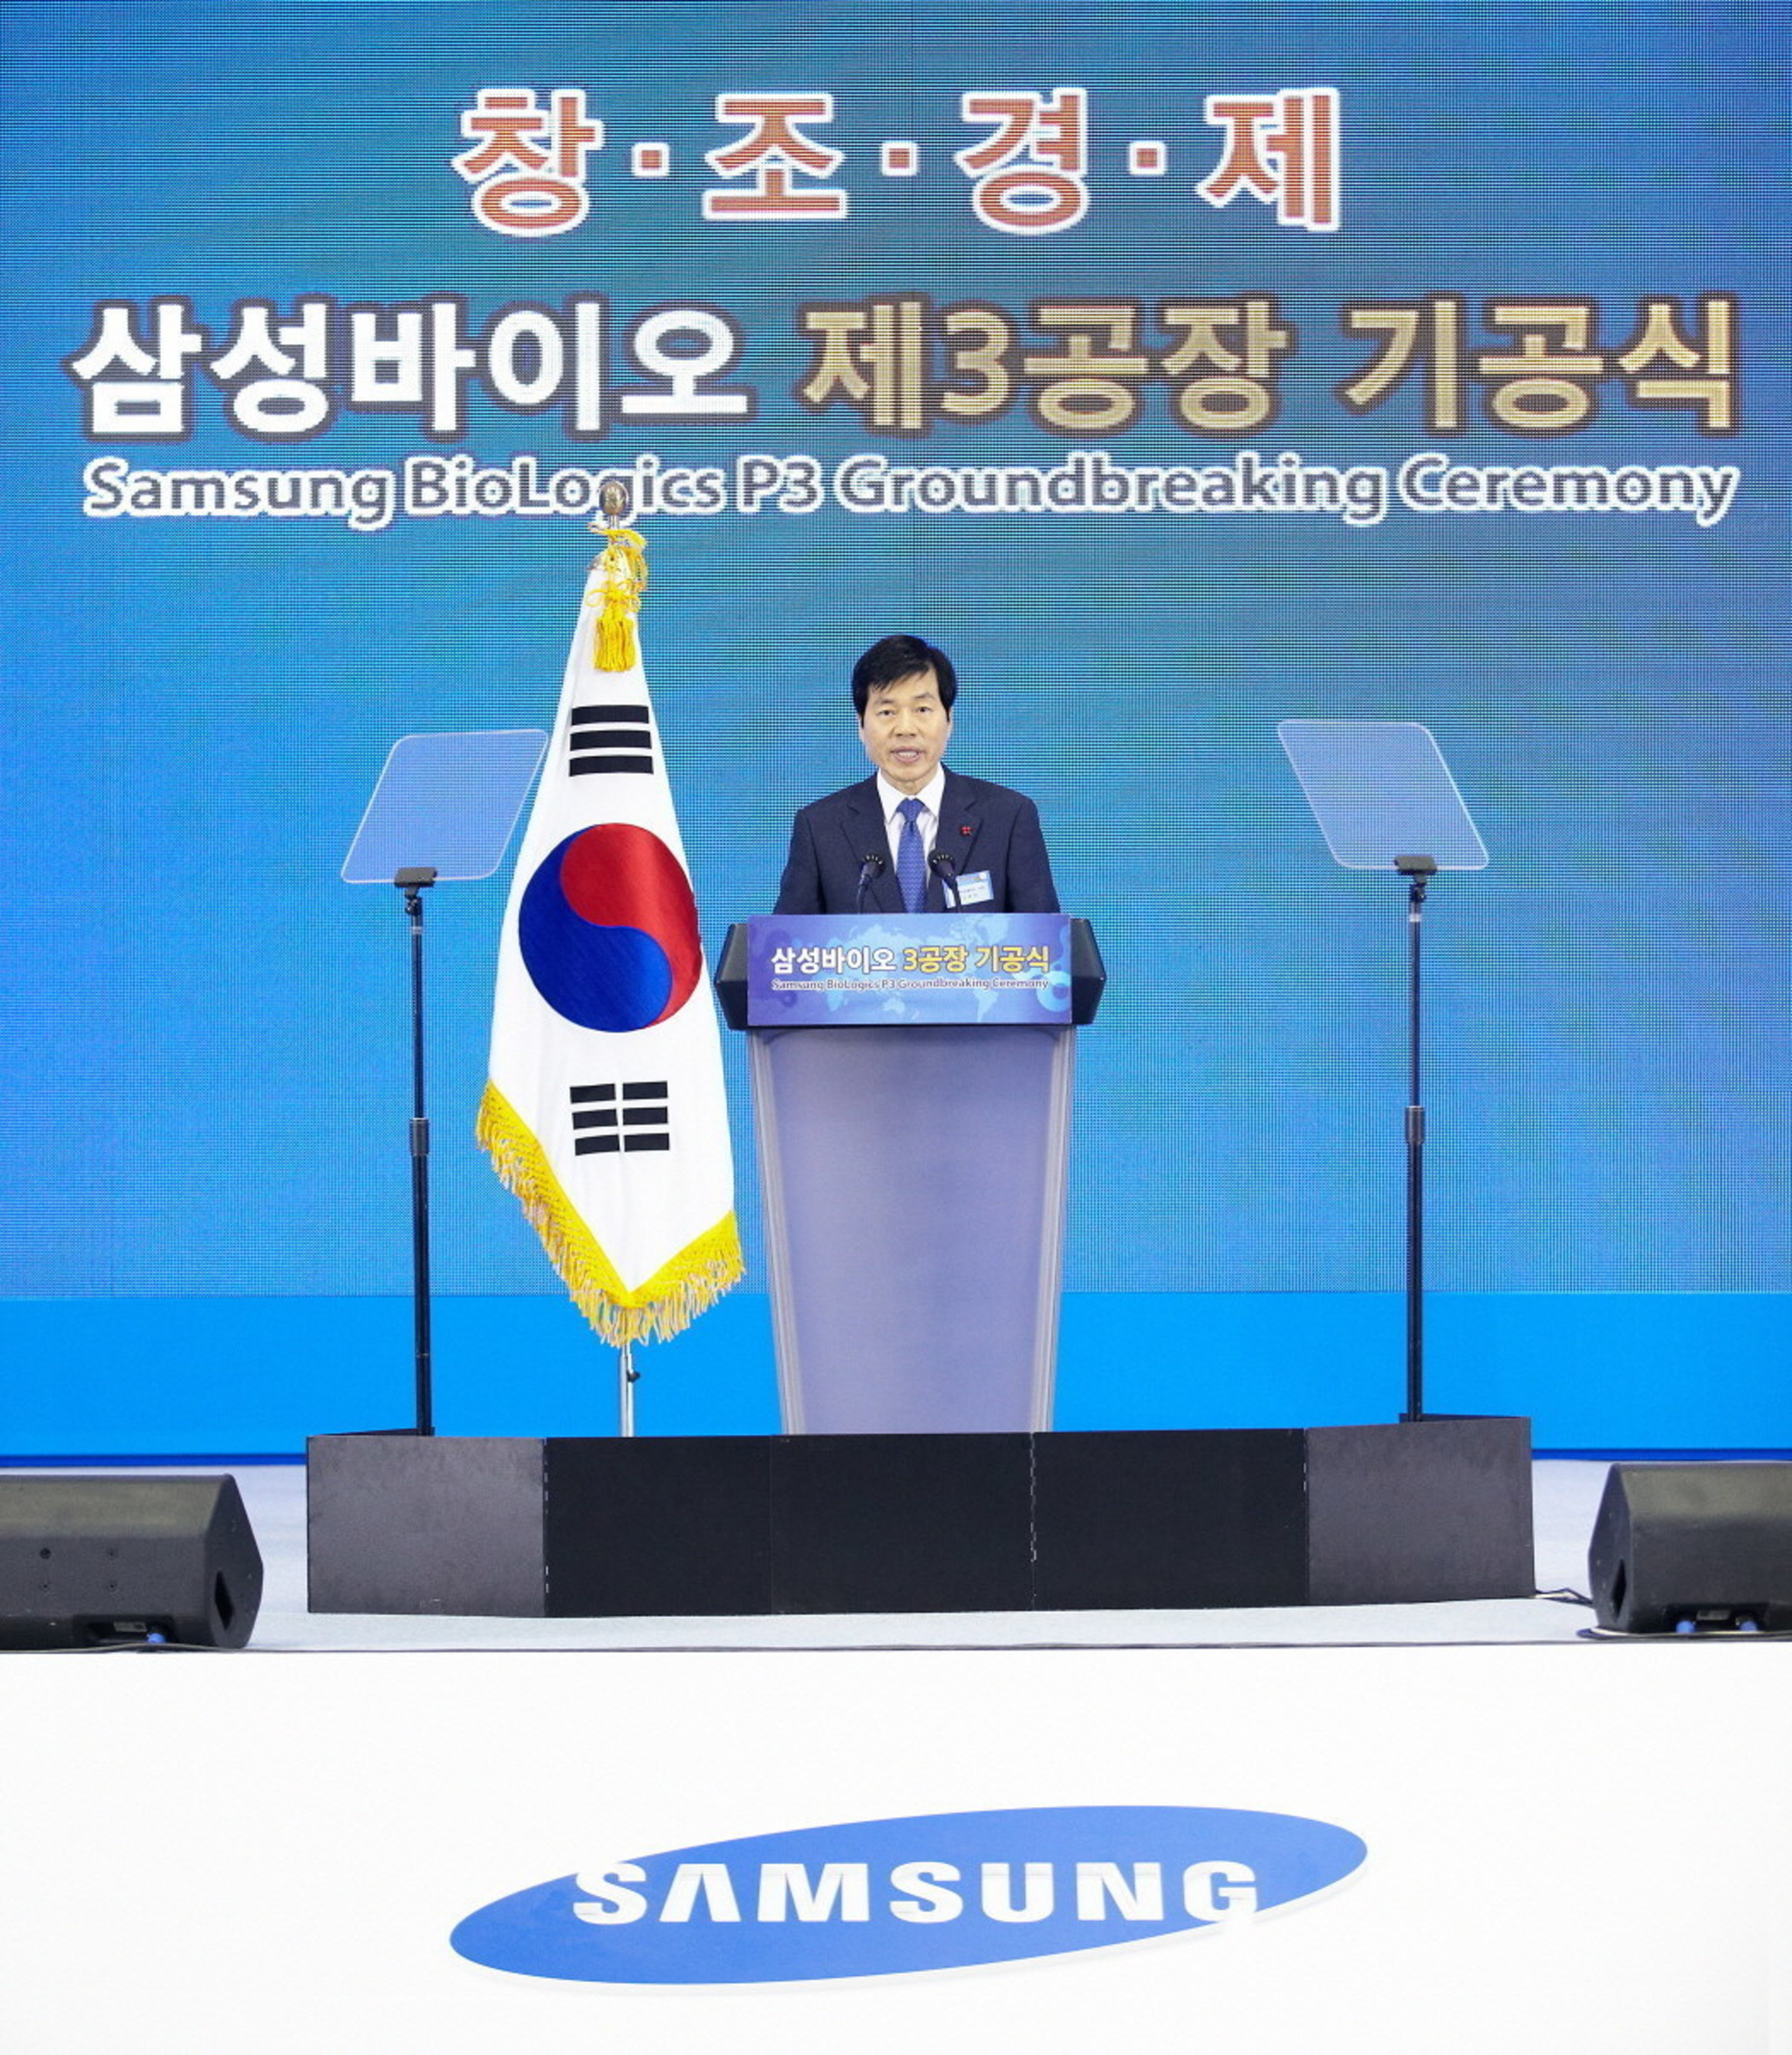 Samsung BioLogics baut weltweit größte Biopharmazie-Fertigungsstätte